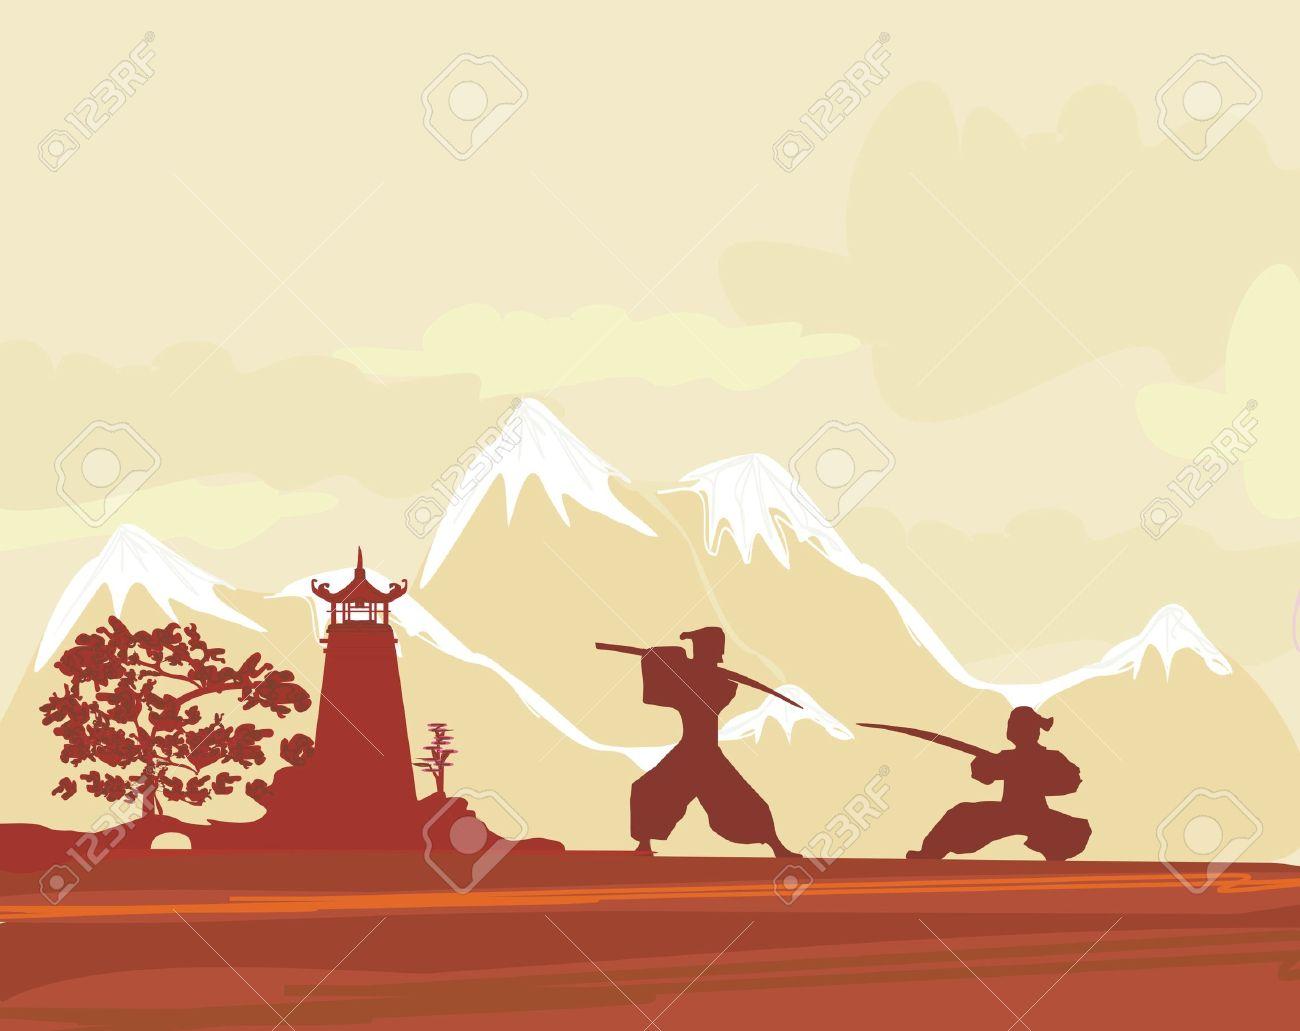 Samurai Silhouette In Asian Landscape Royalty Free Cliparts